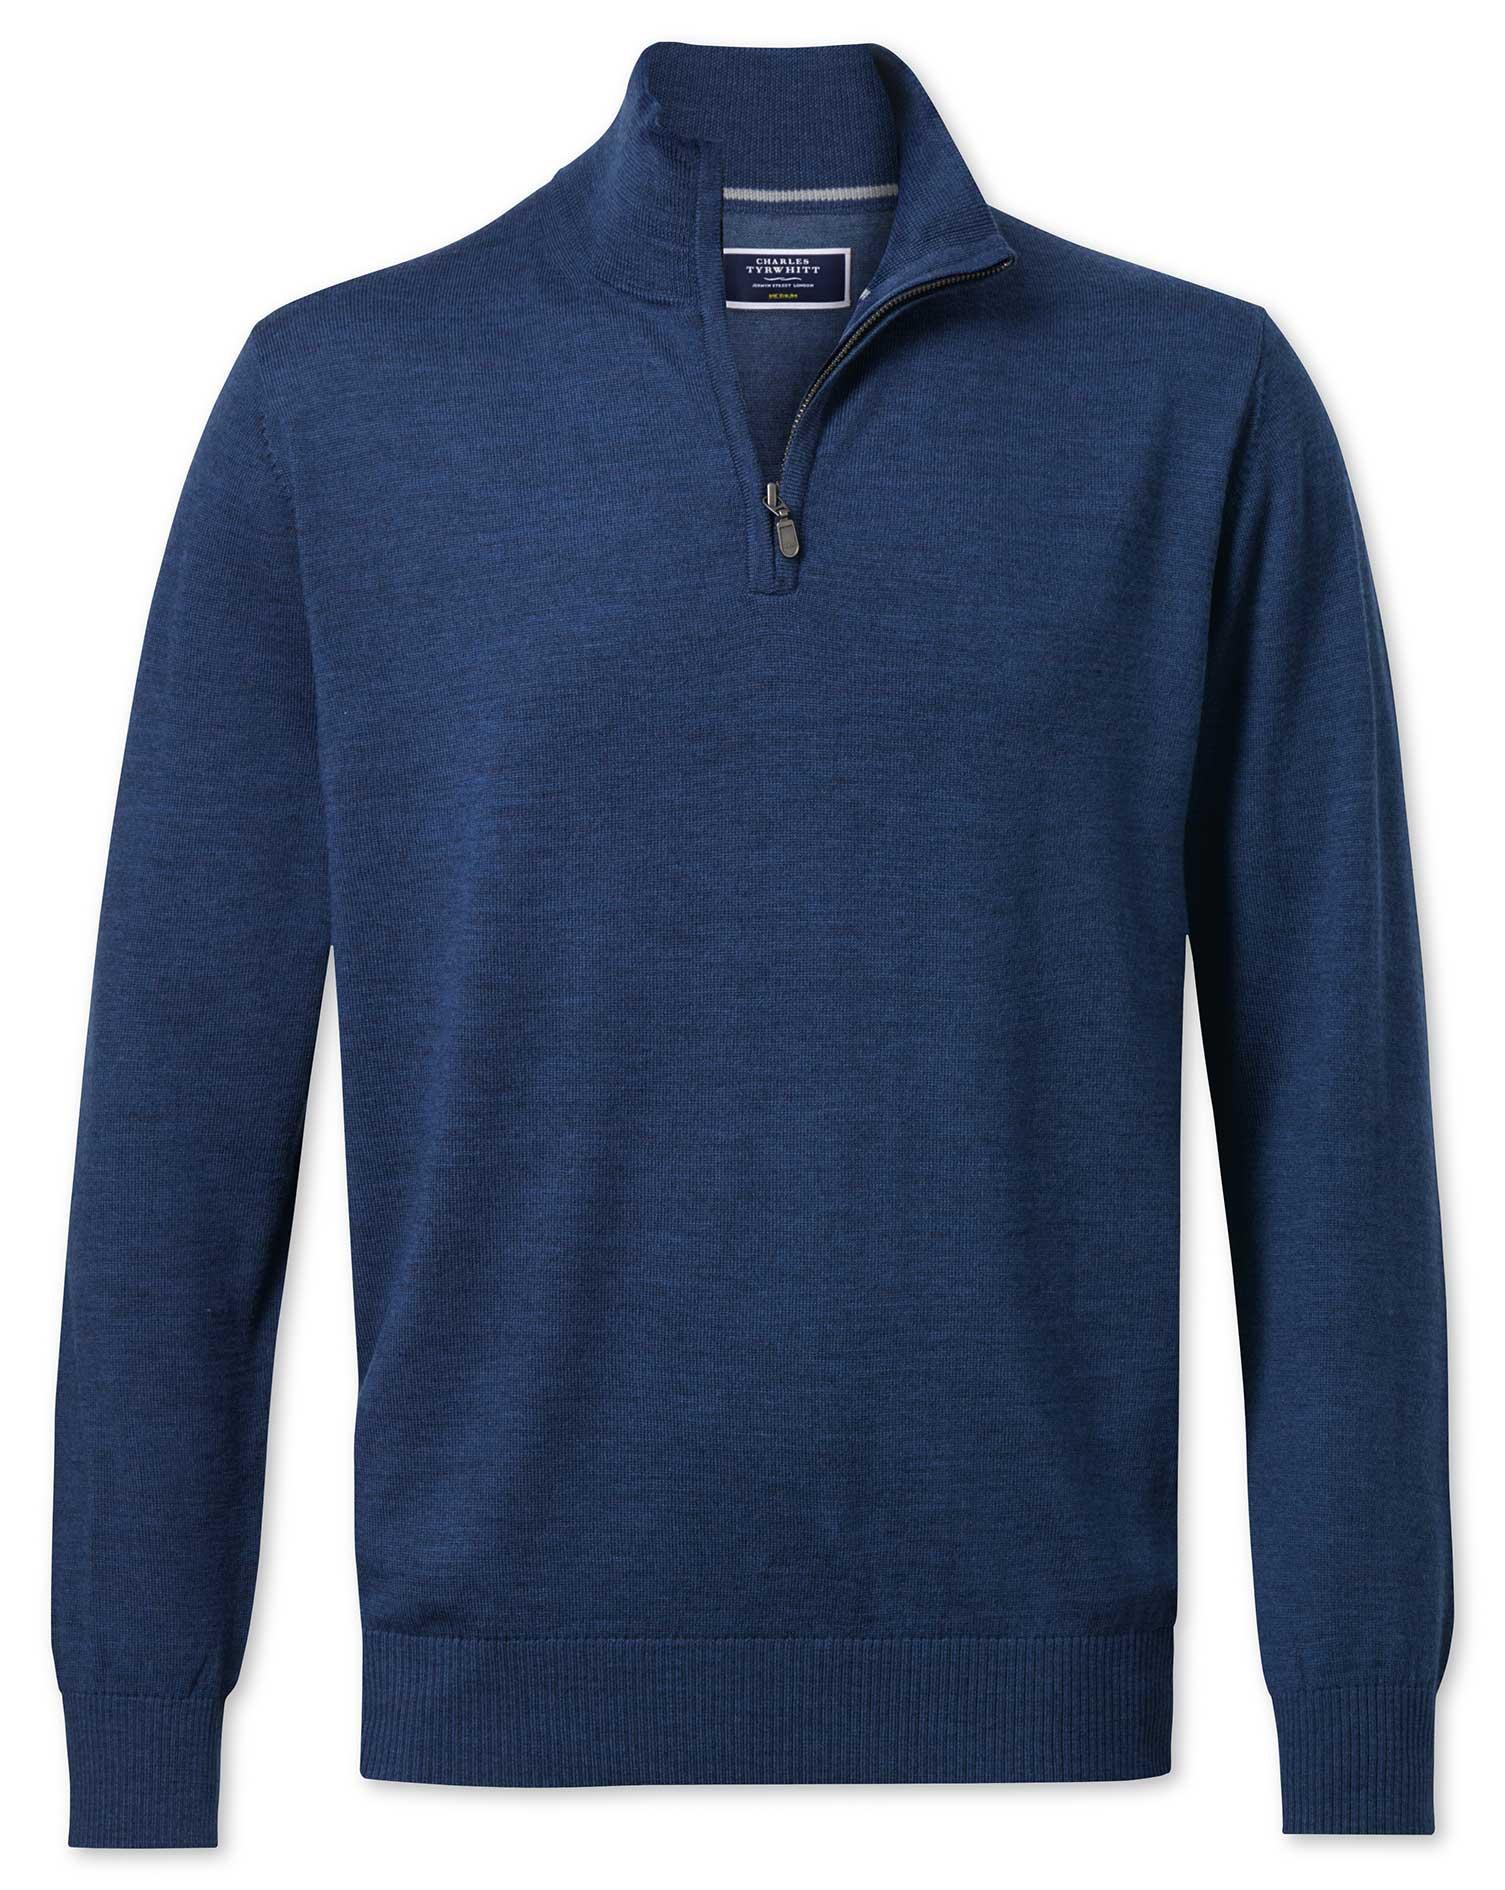 Mid Blue Merino Wool Zip Neck Jumper Size Small by Charles Tyrwhitt